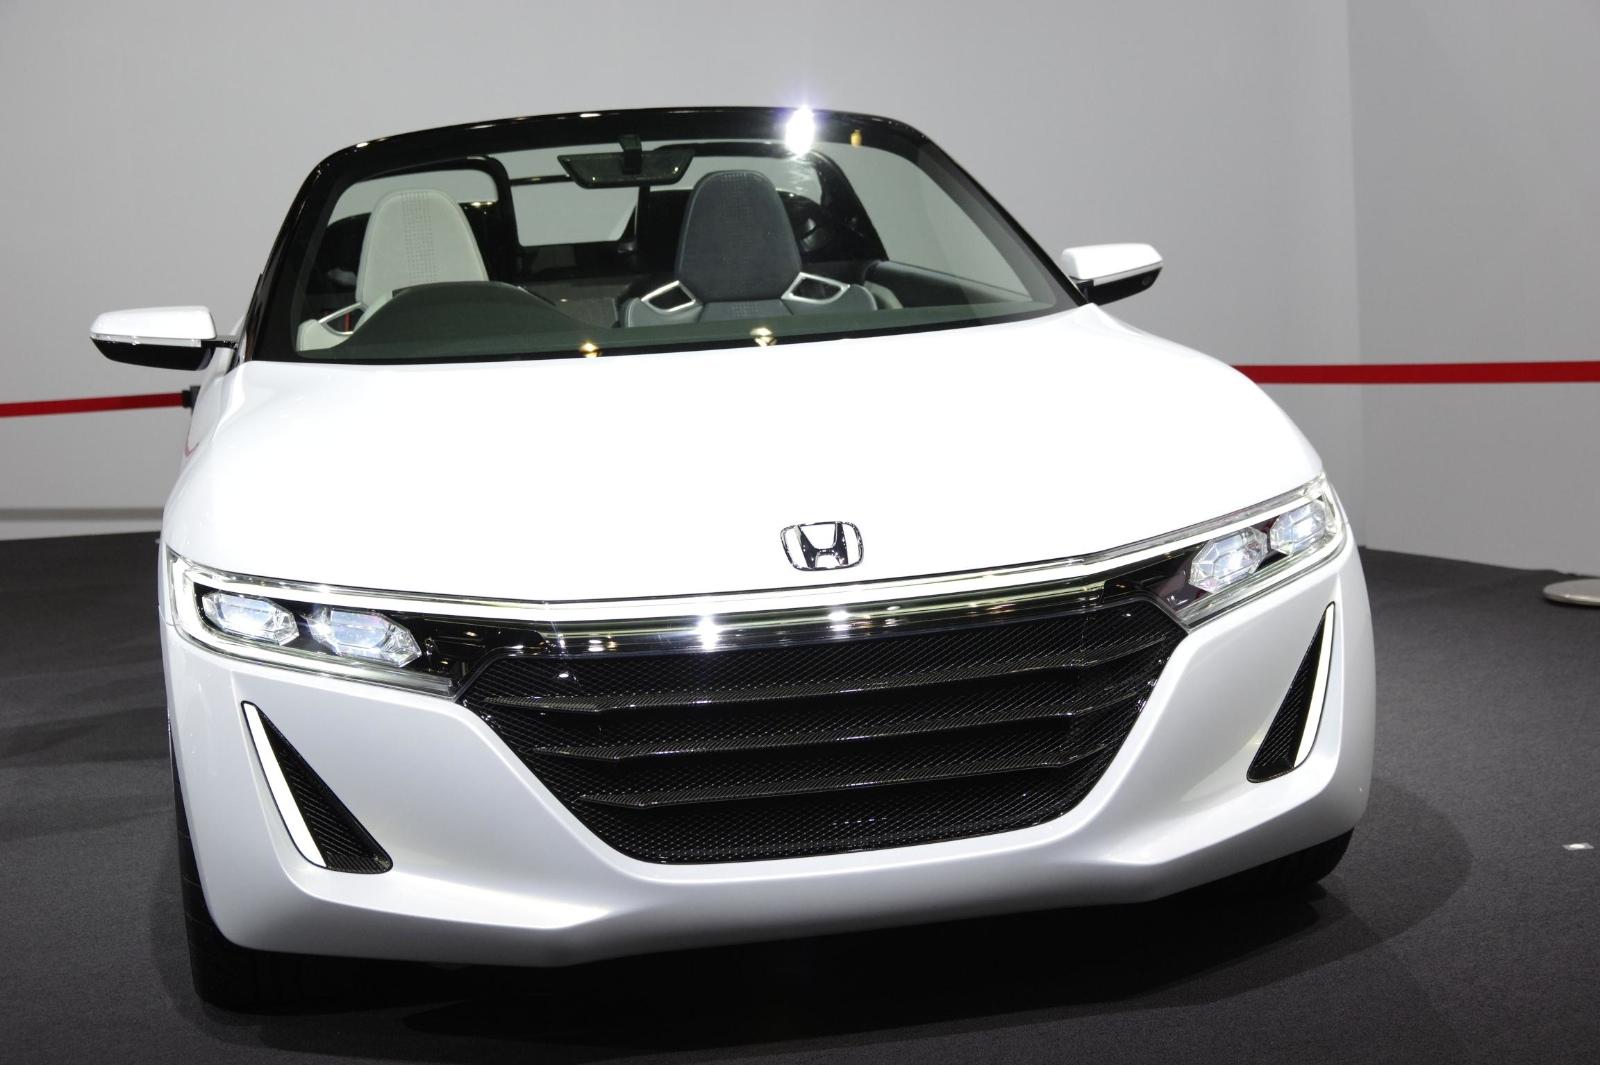 2013 Honda Civic Si Car Wallpaper Shrunken Nsx Honda S660 Kei Sportscar Coming In 2015